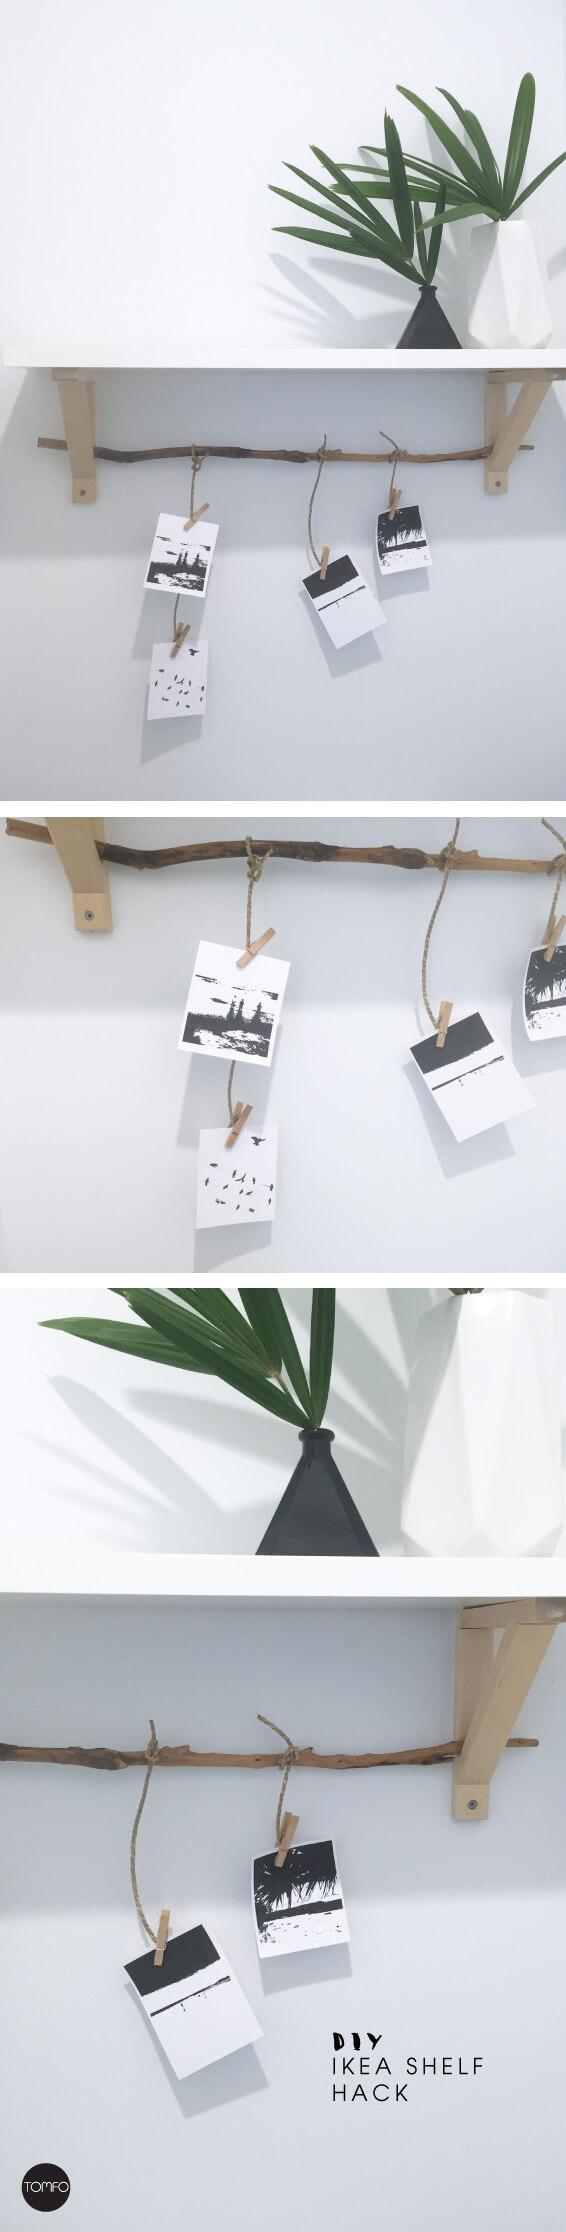 TOMFO-Easy-Diy-Ikea-shelf-hack